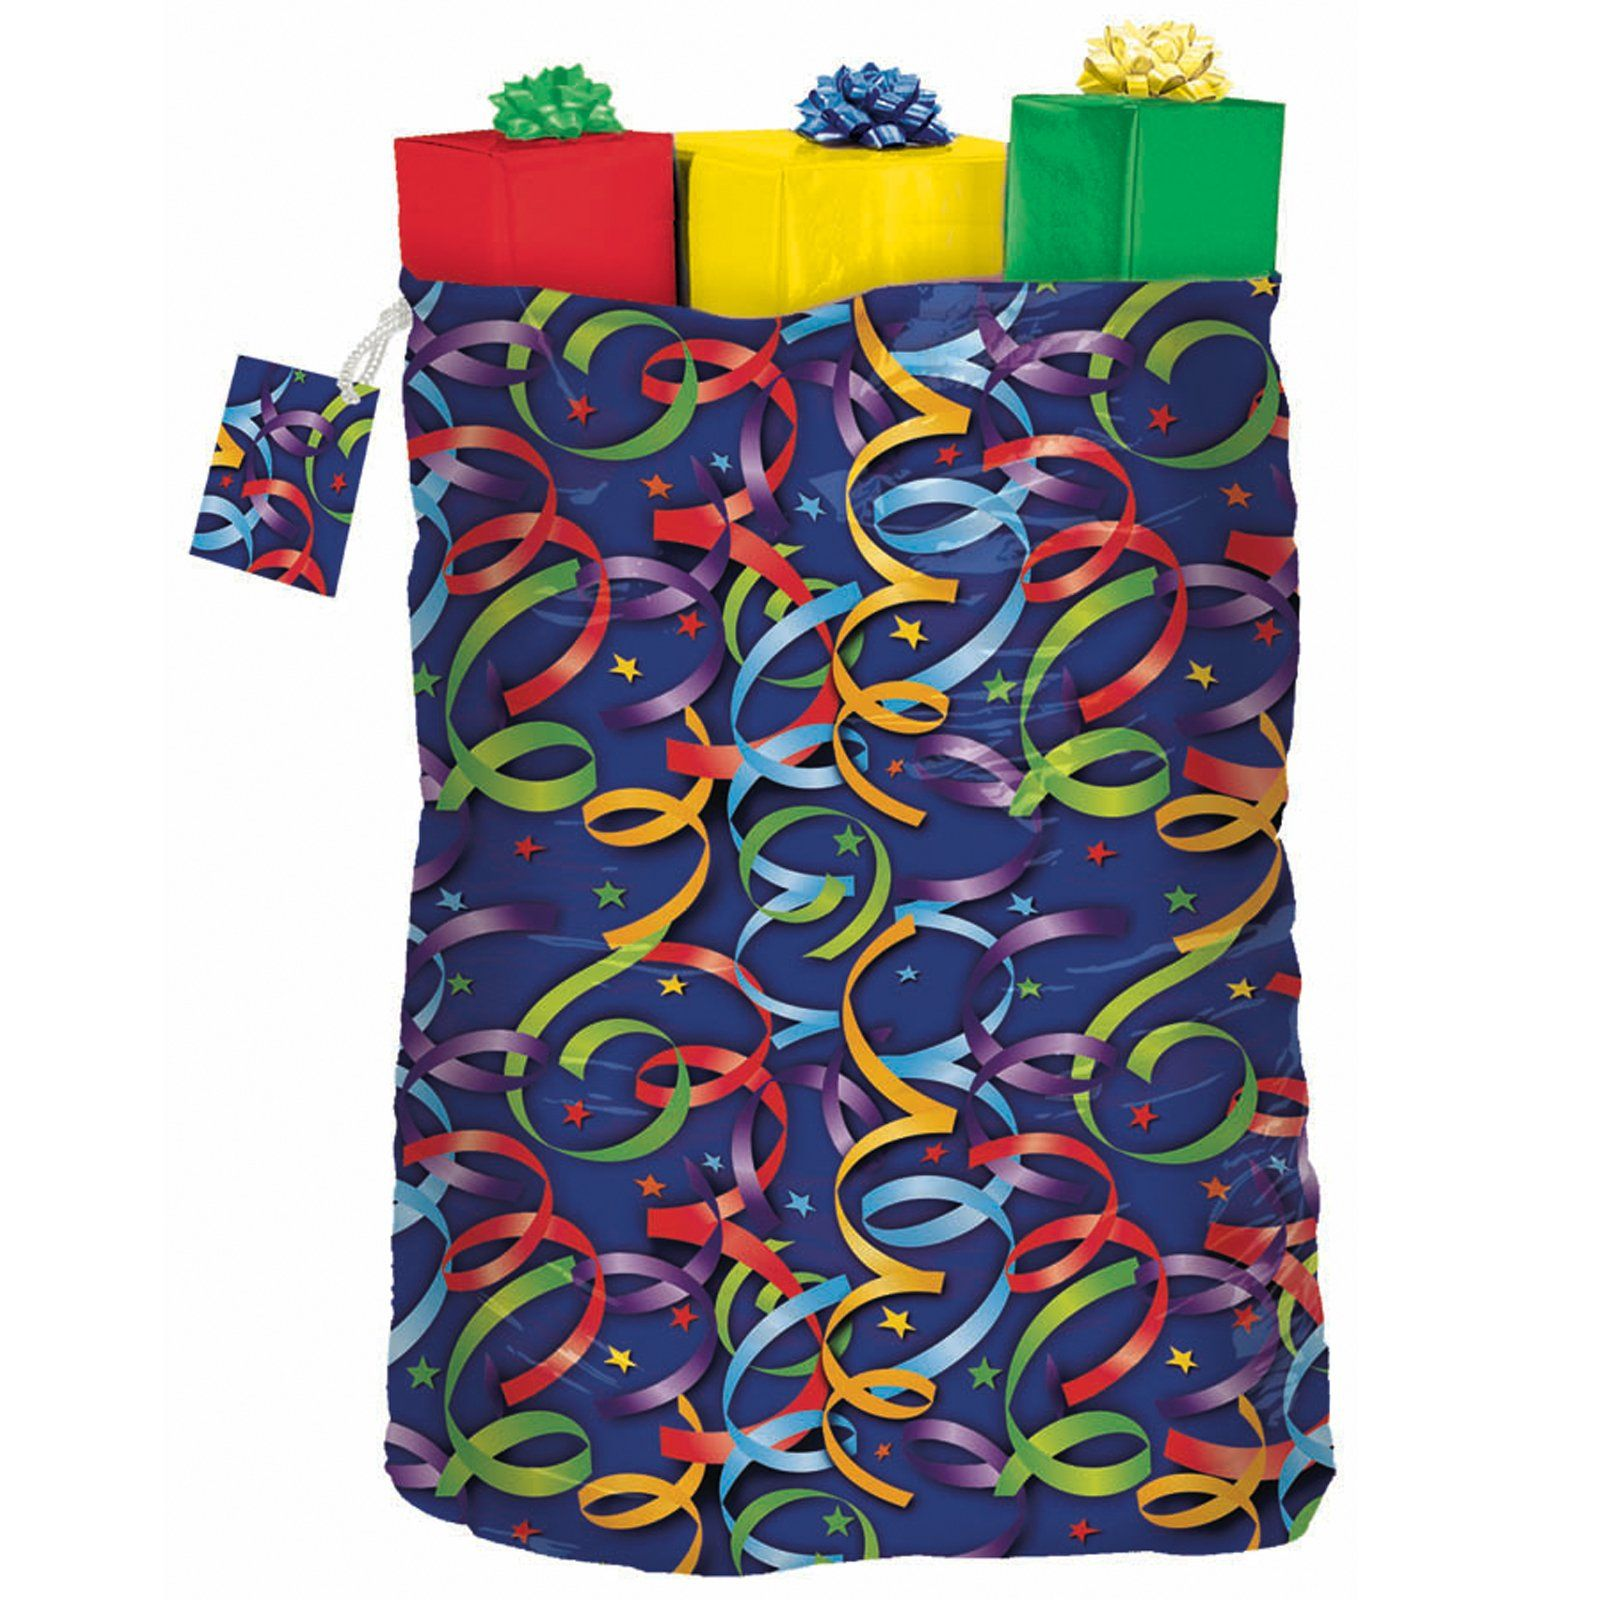 Celebration Streamers Giant Gift Sack, 82378